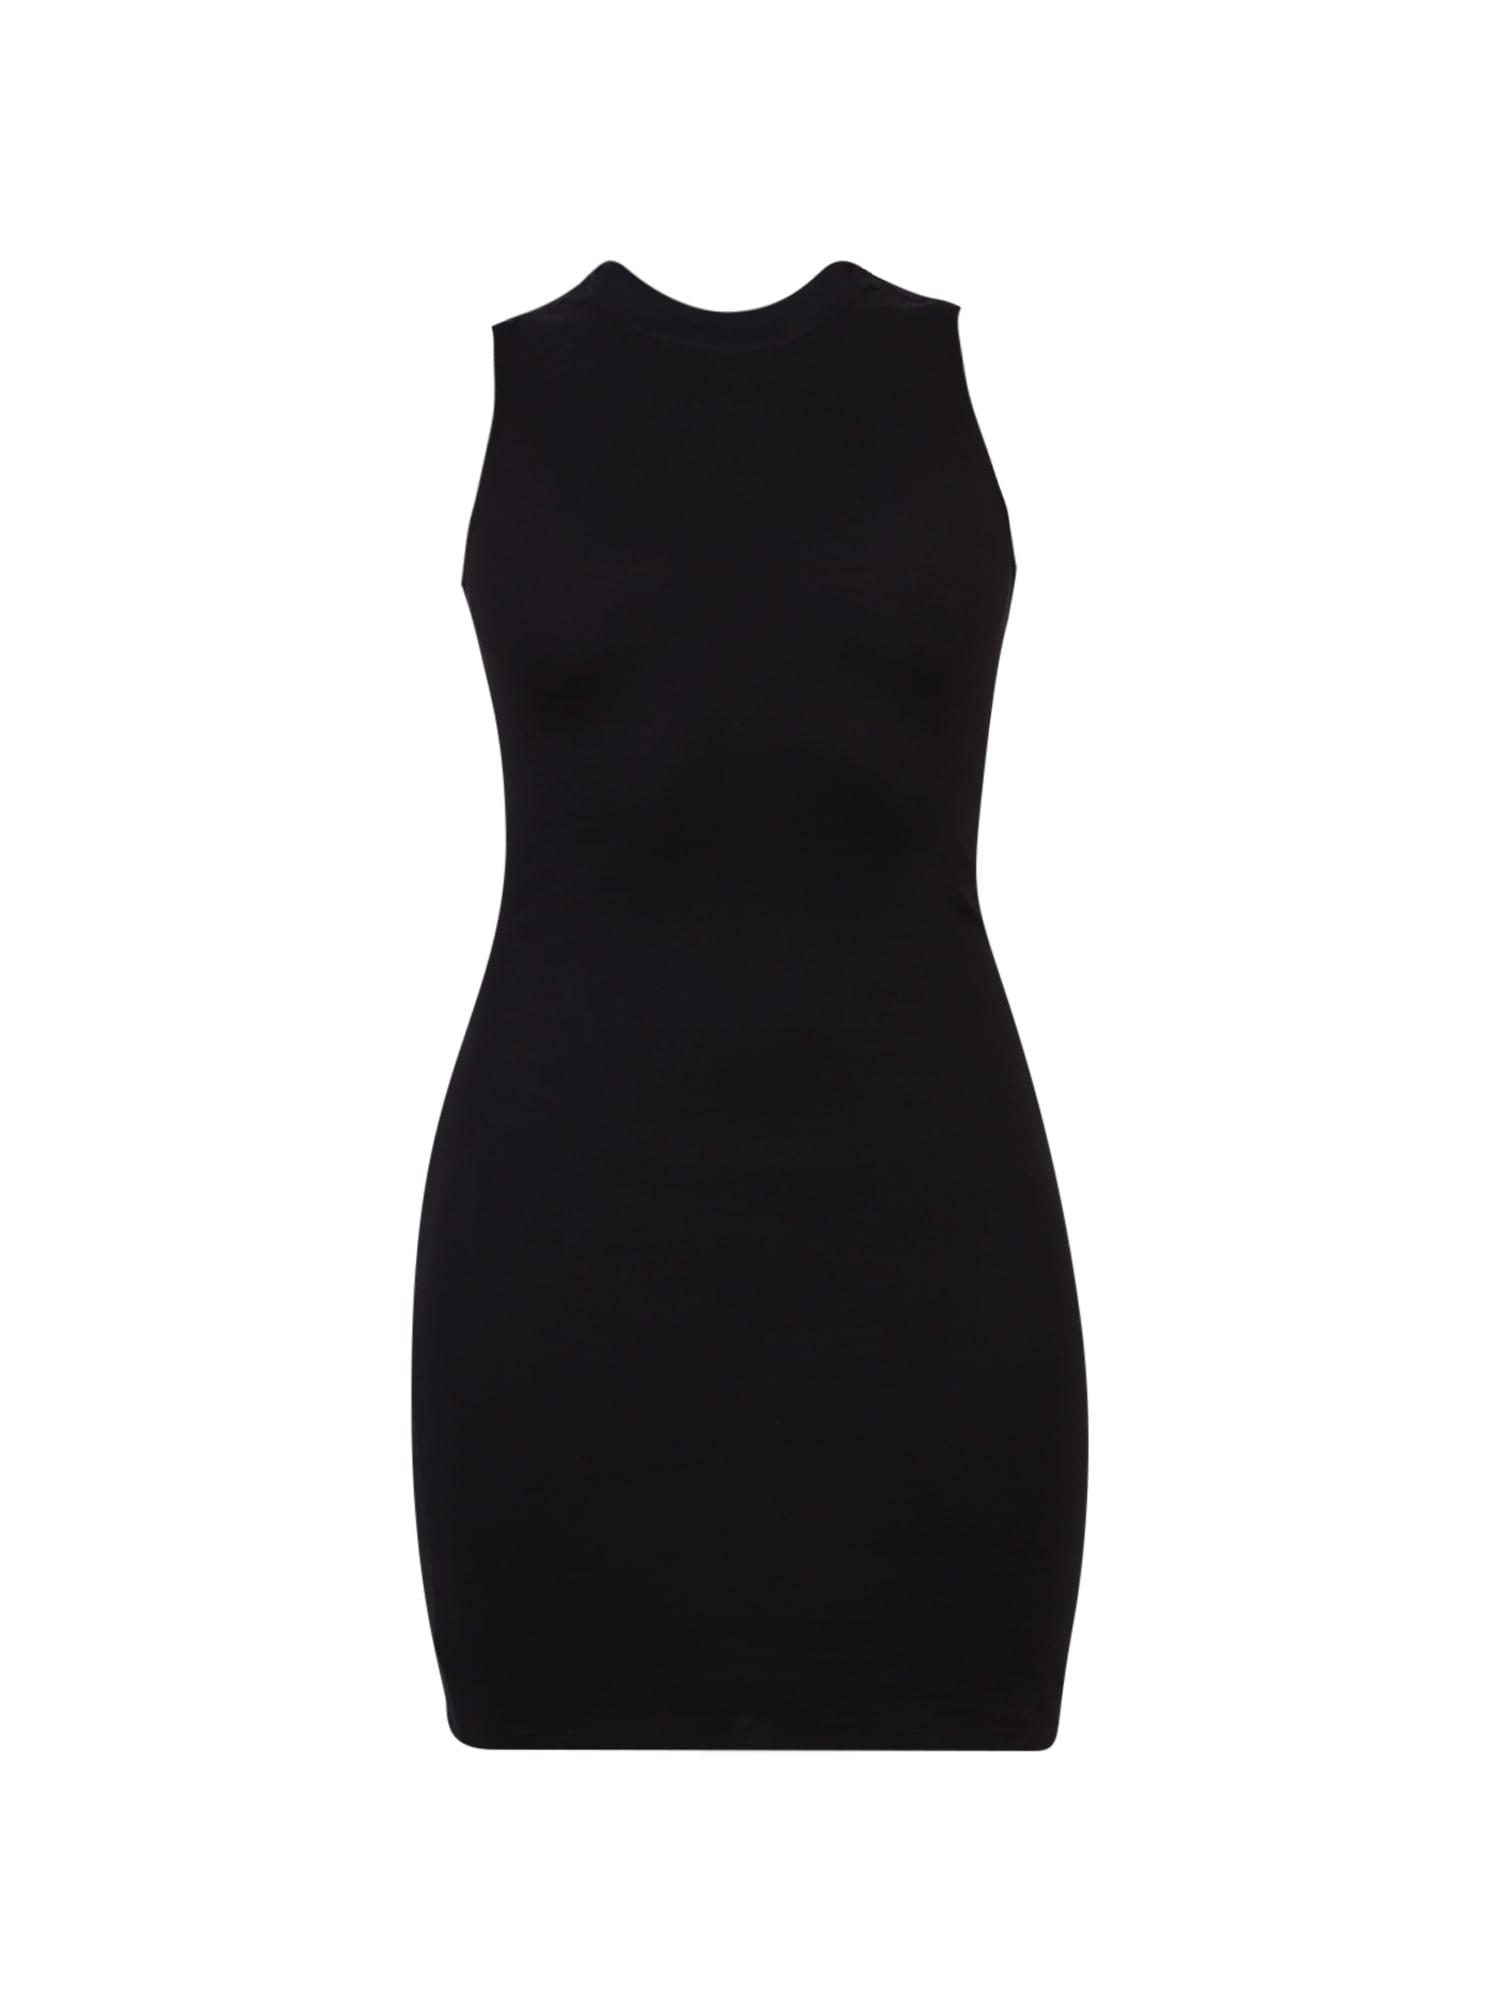 Buy 1017 ALYX 9SM Mini Dress online, shop 1017 ALYX 9SM with free shipping